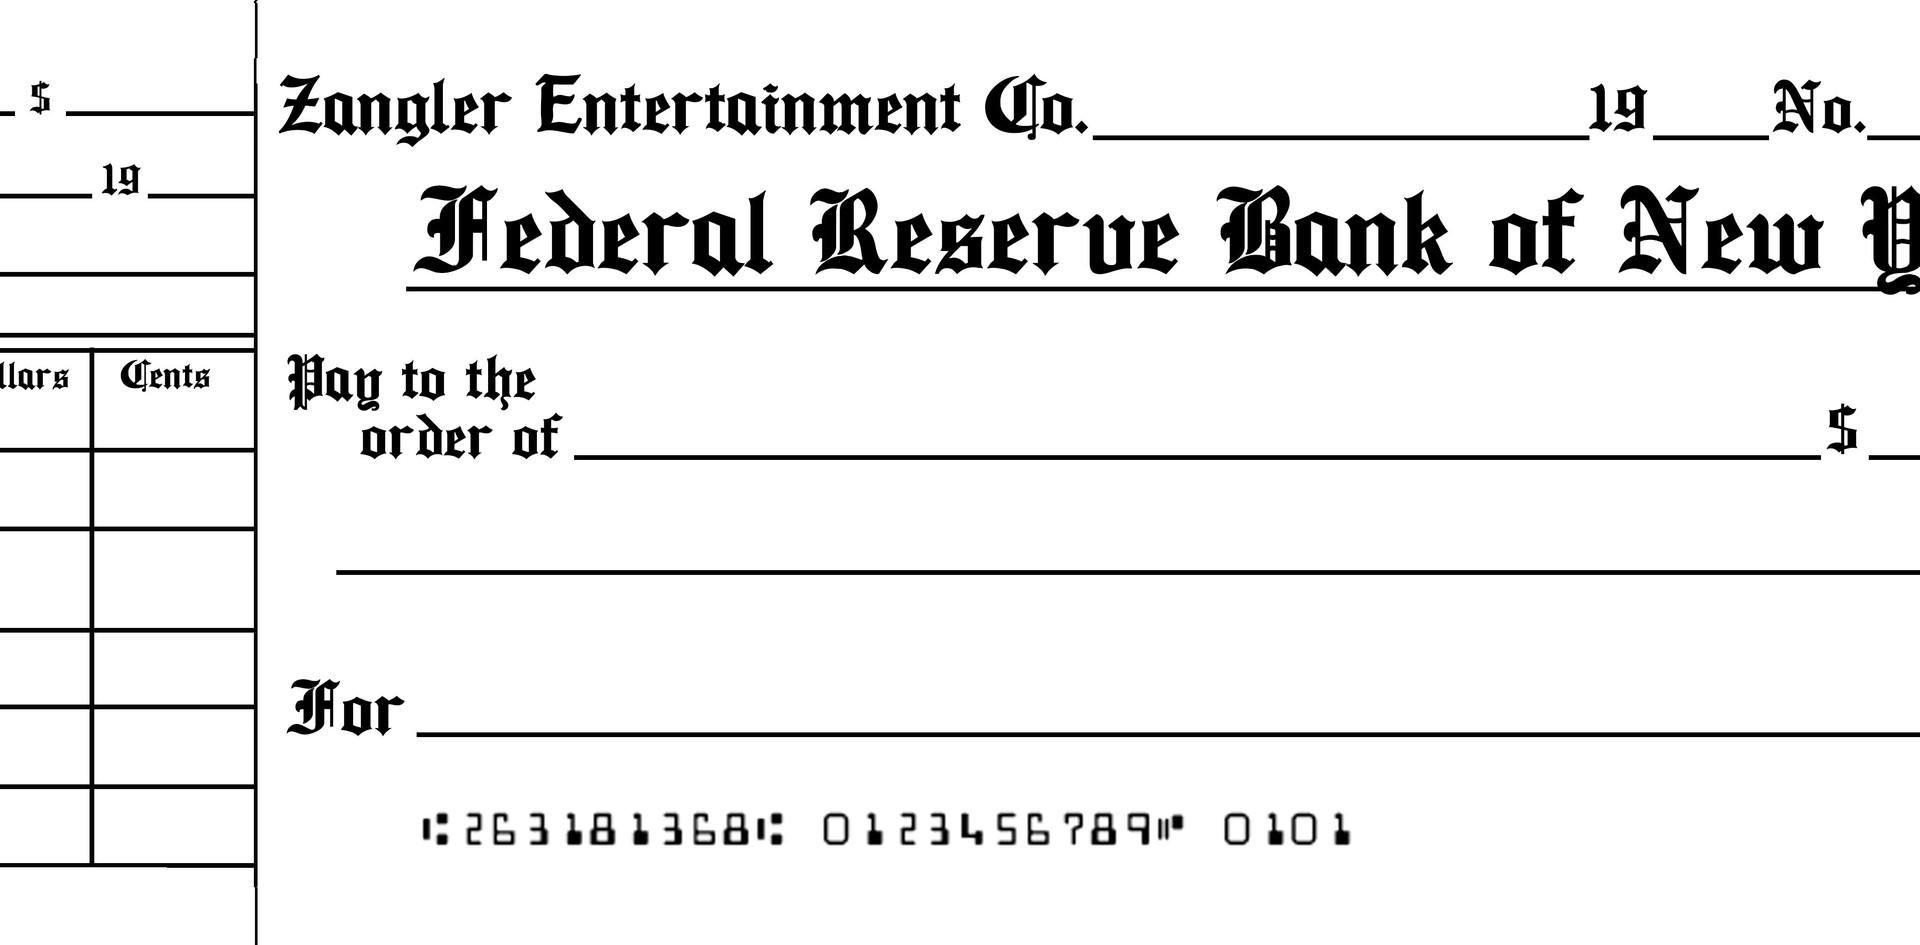 Checks for Bella Zangler's check book